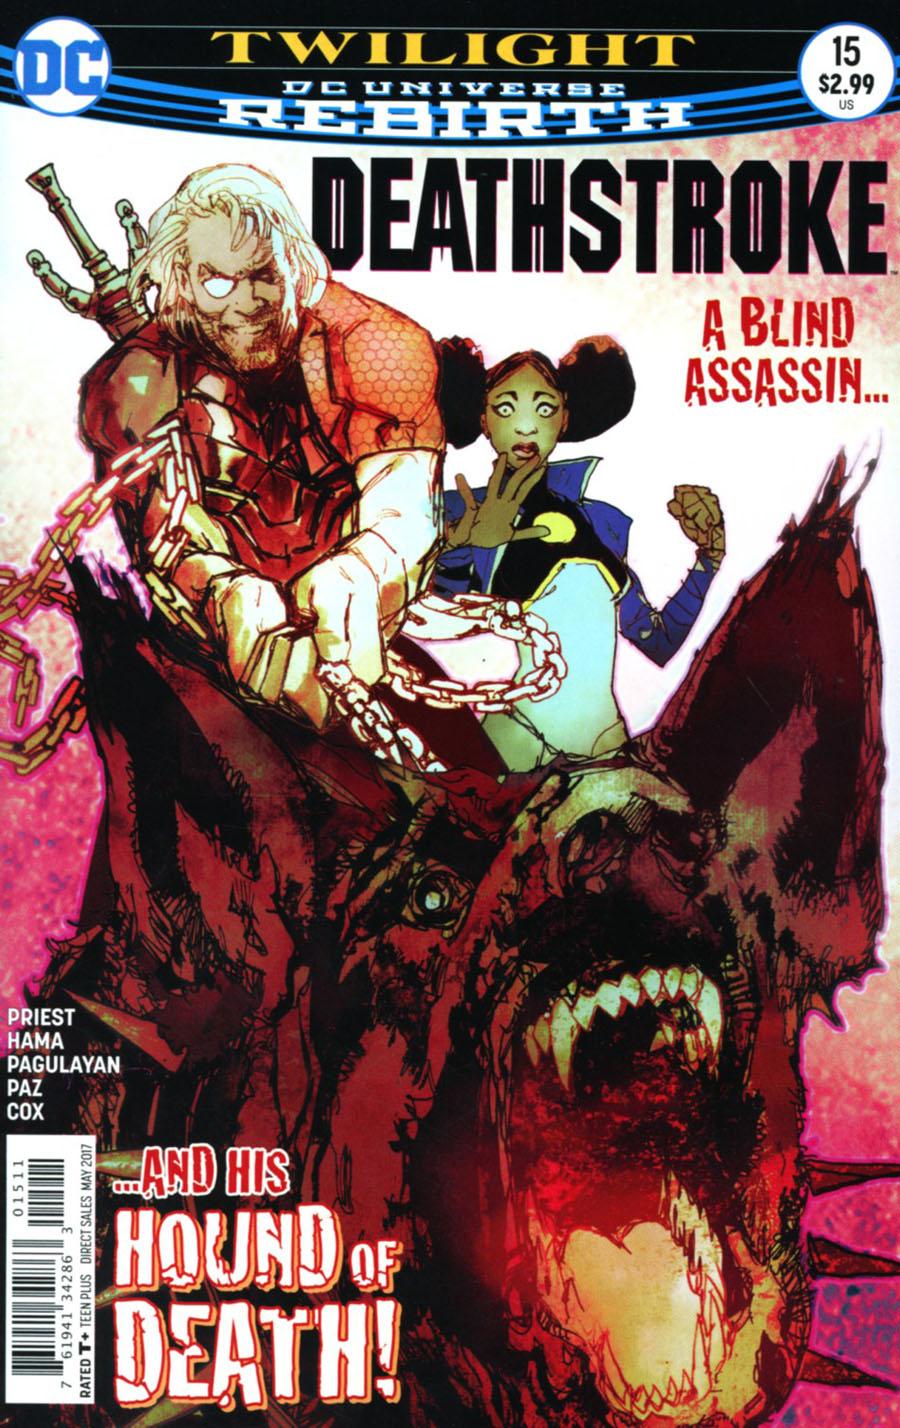 Deathstroke Vol 4 #15 Cover A Regular Bill Sienkiewicz Cover